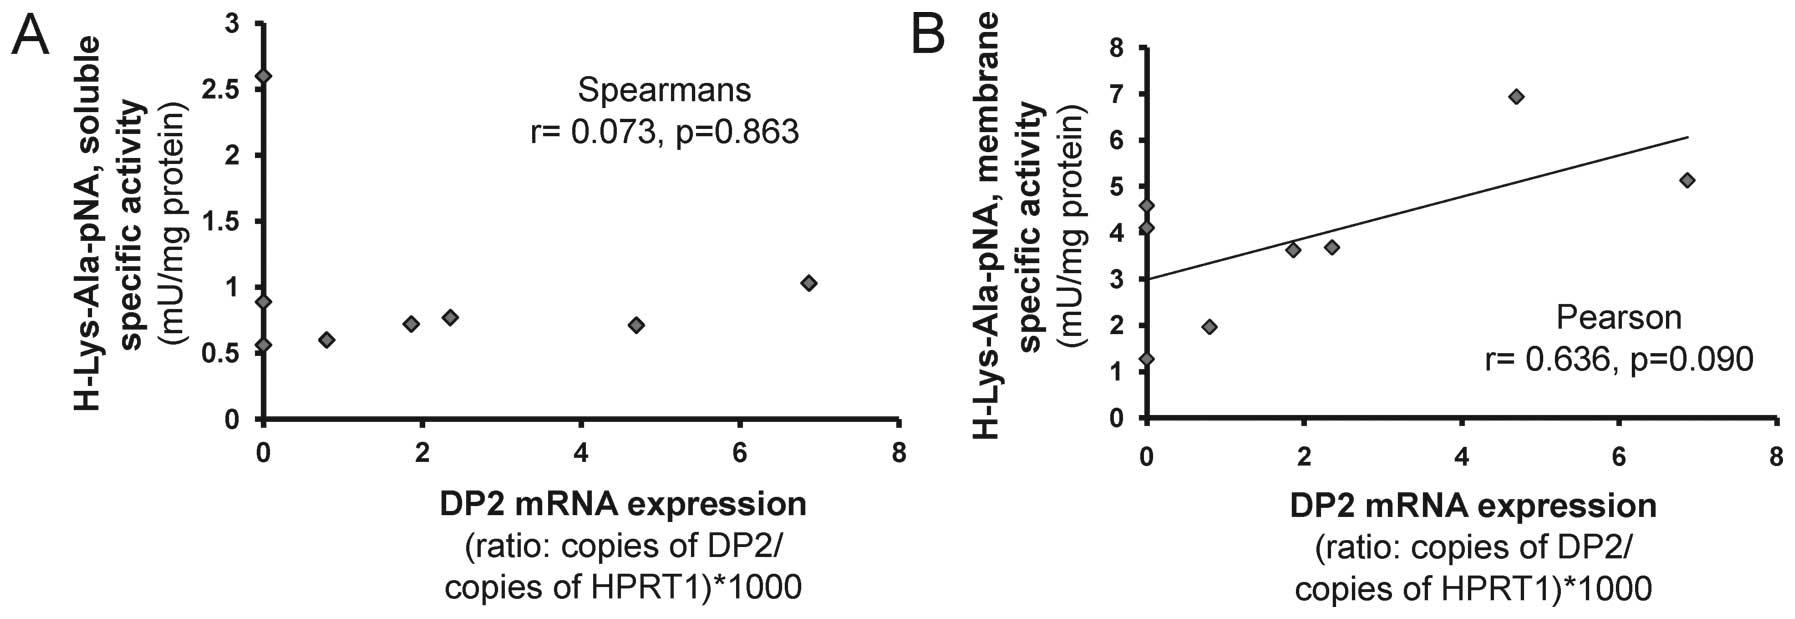 Moderate Positive Correlation Correlation analysis between: galleryhip.com/moderate-positive-correlation.html